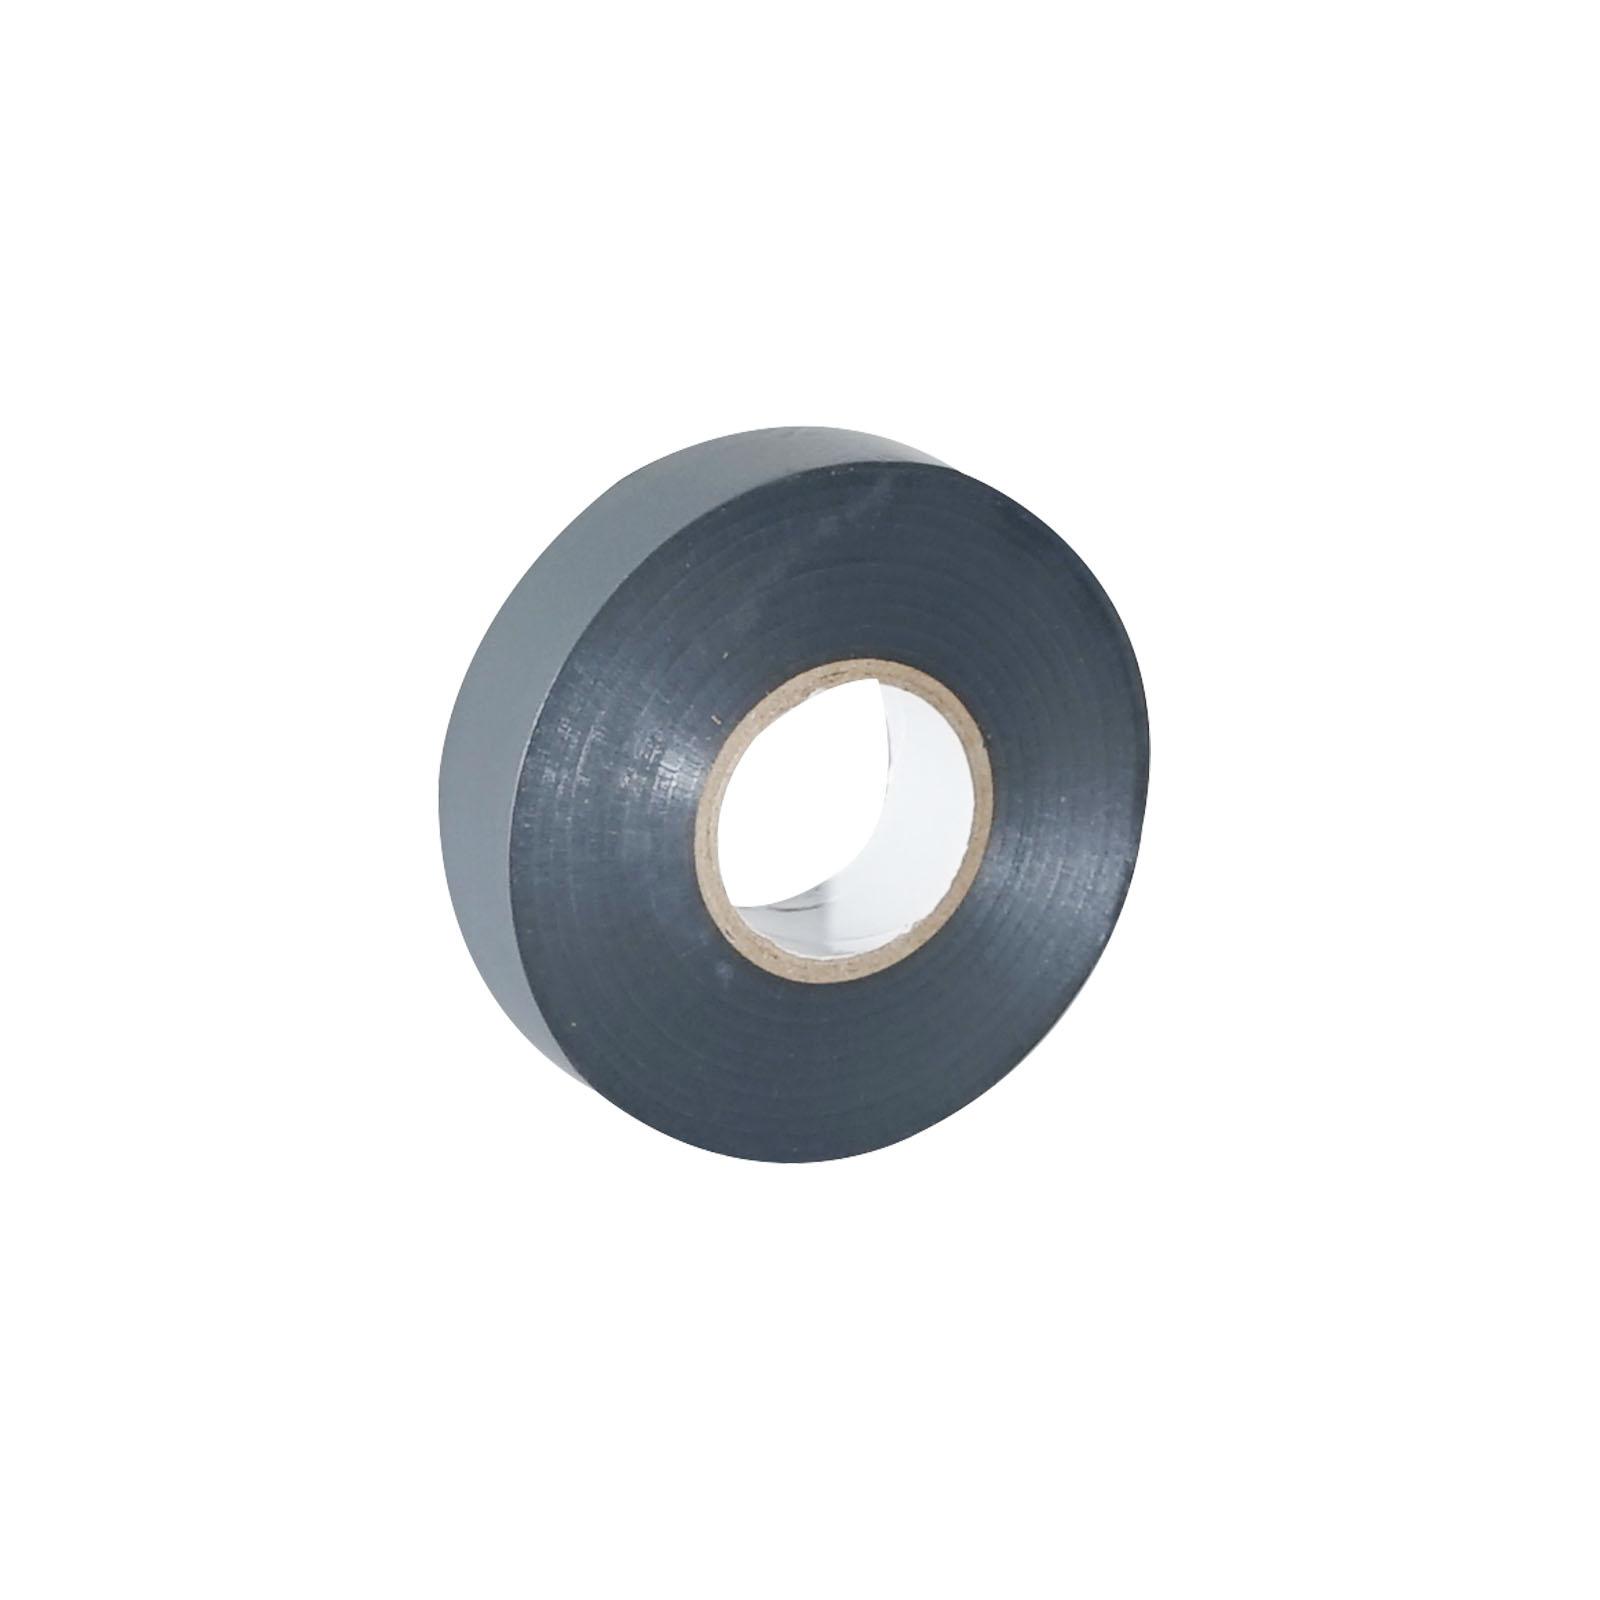 Grey Economy PVC Insulation Tape 19mm x 33m